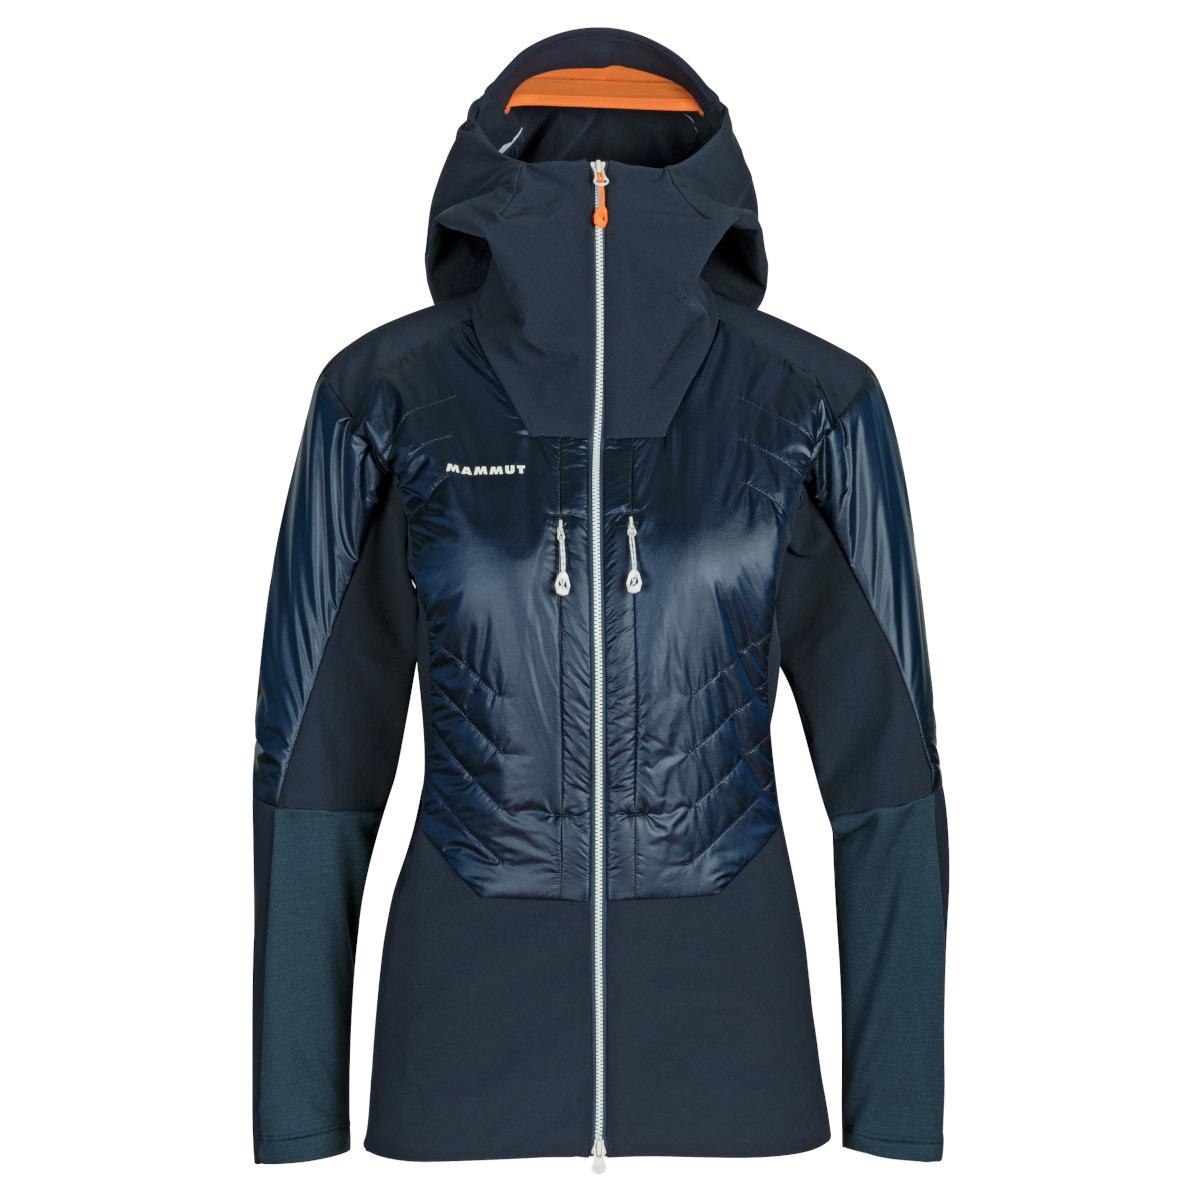 Mammut Eisfeld Softshell Hybrid Hooded Jacket Women - night